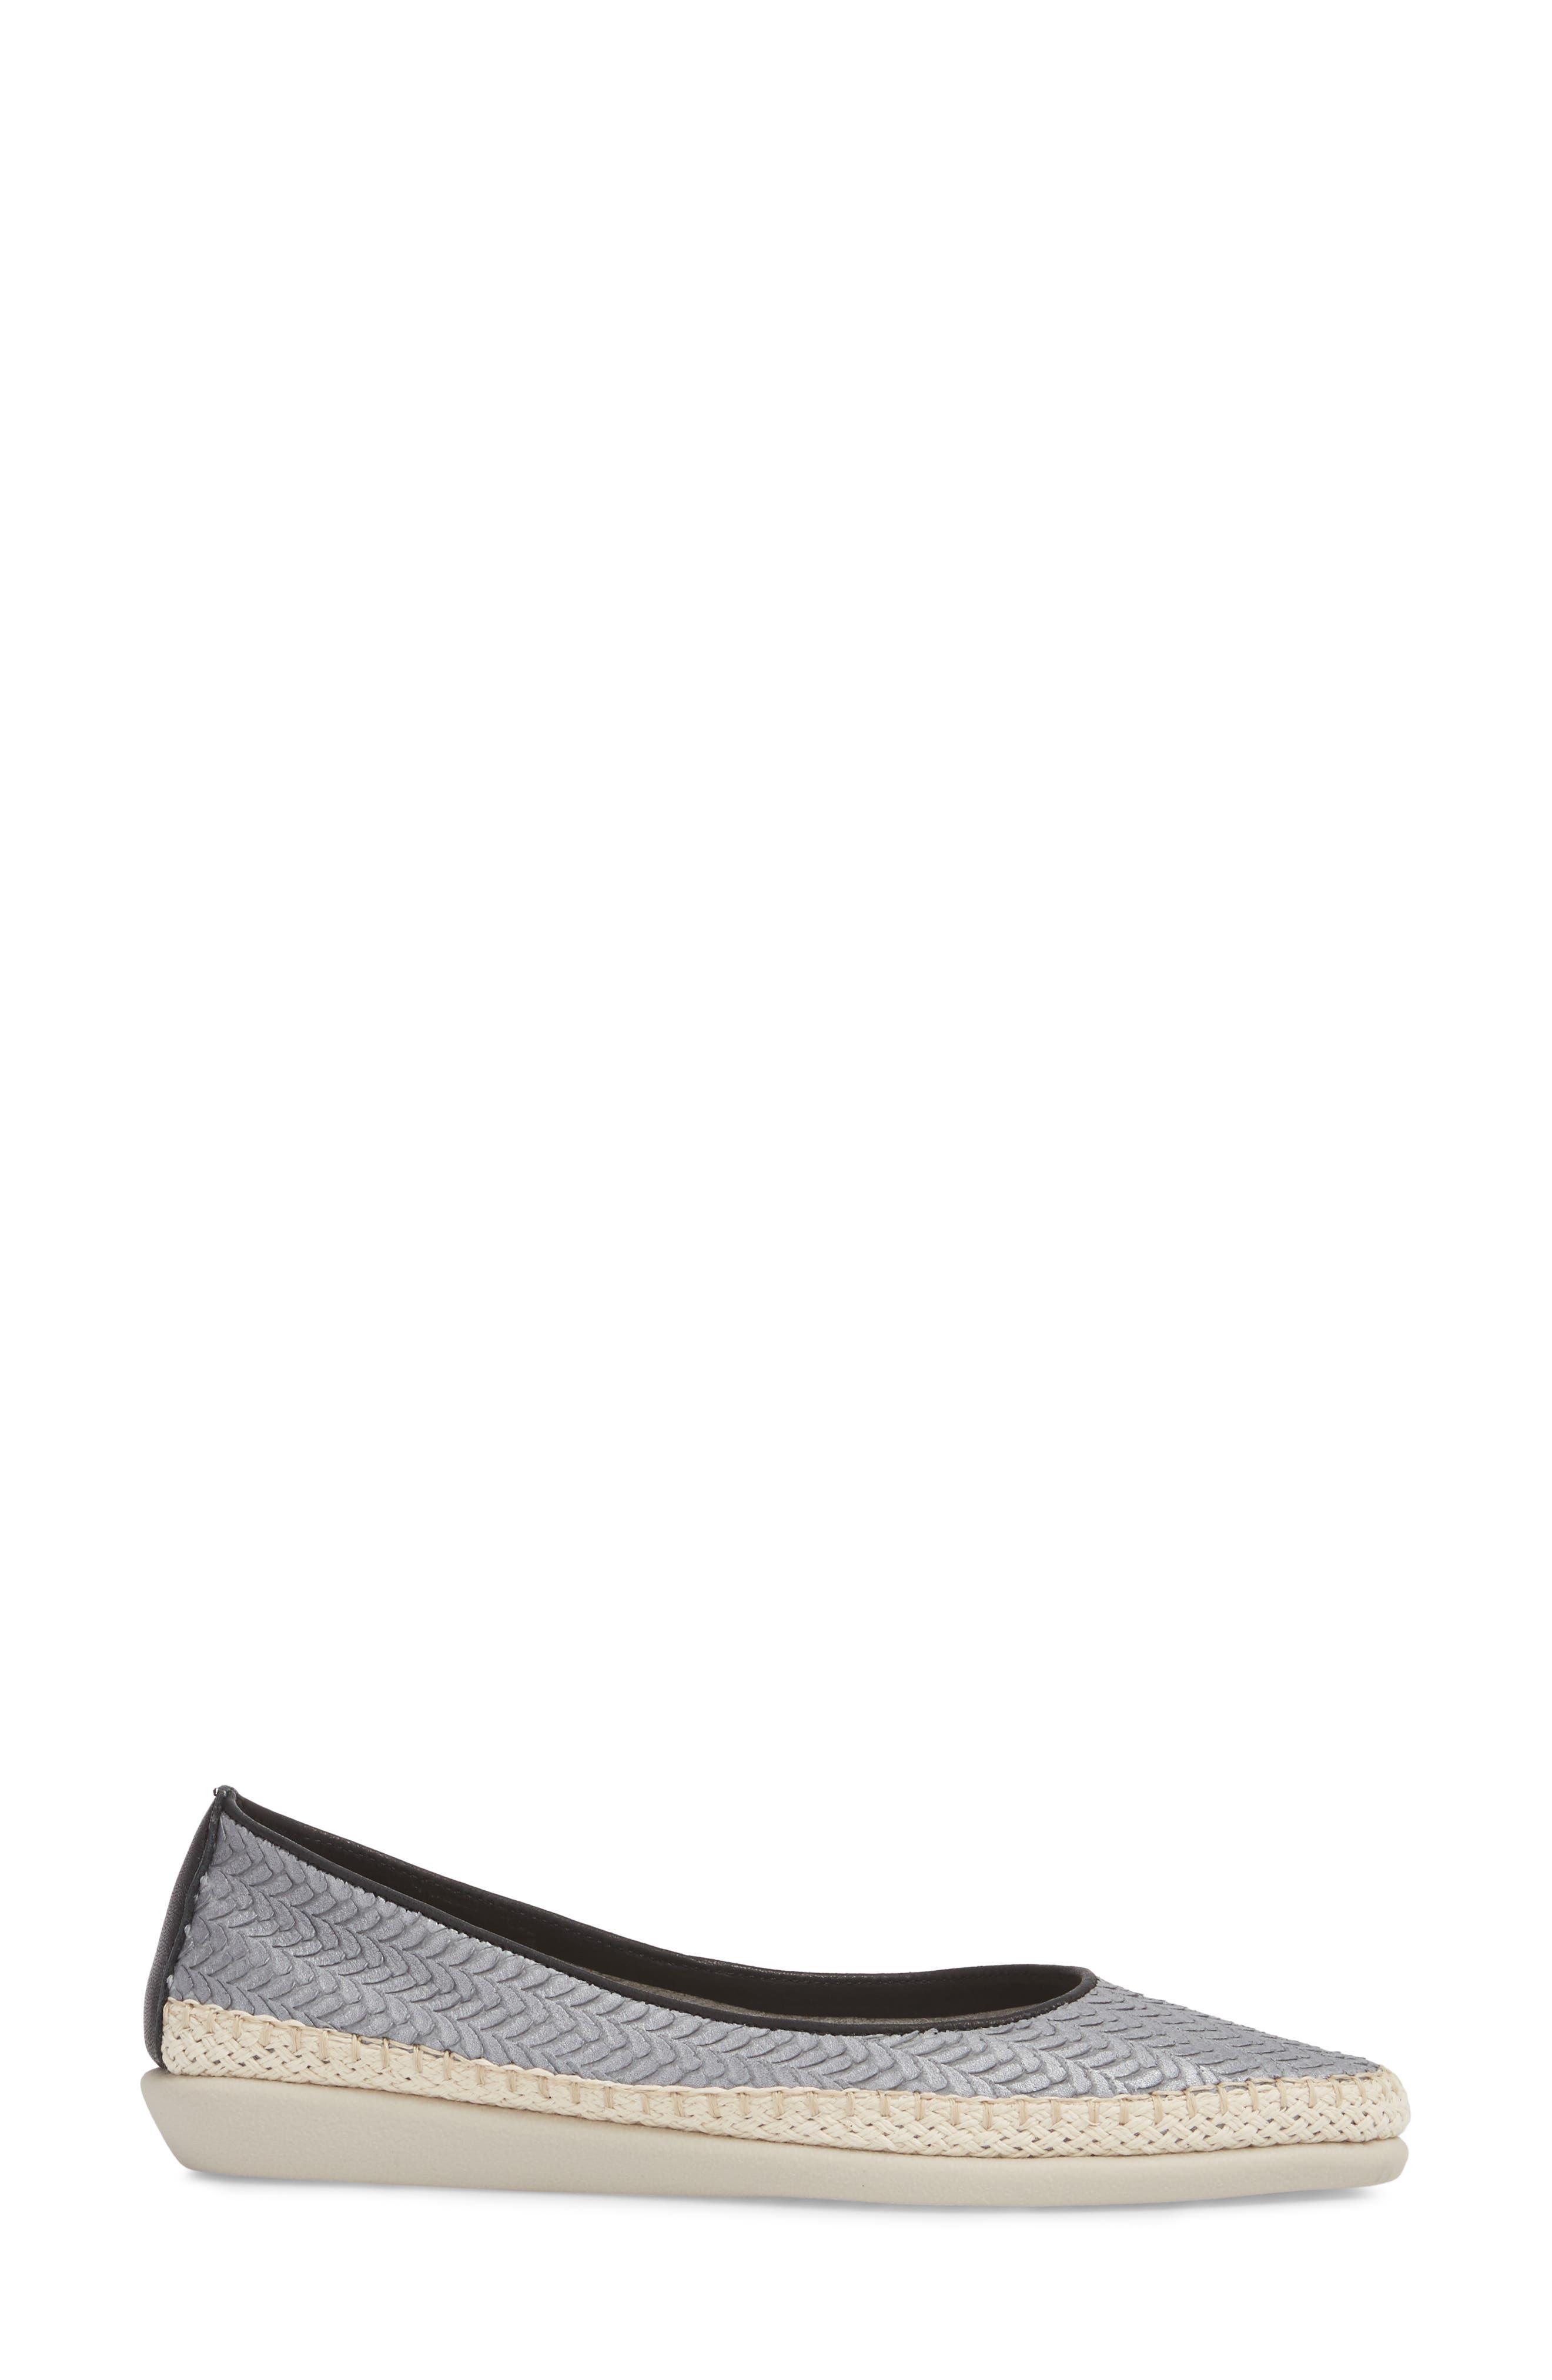 'Torri' Perforated Espadrille Flat,                             Alternate thumbnail 3, color,                             040